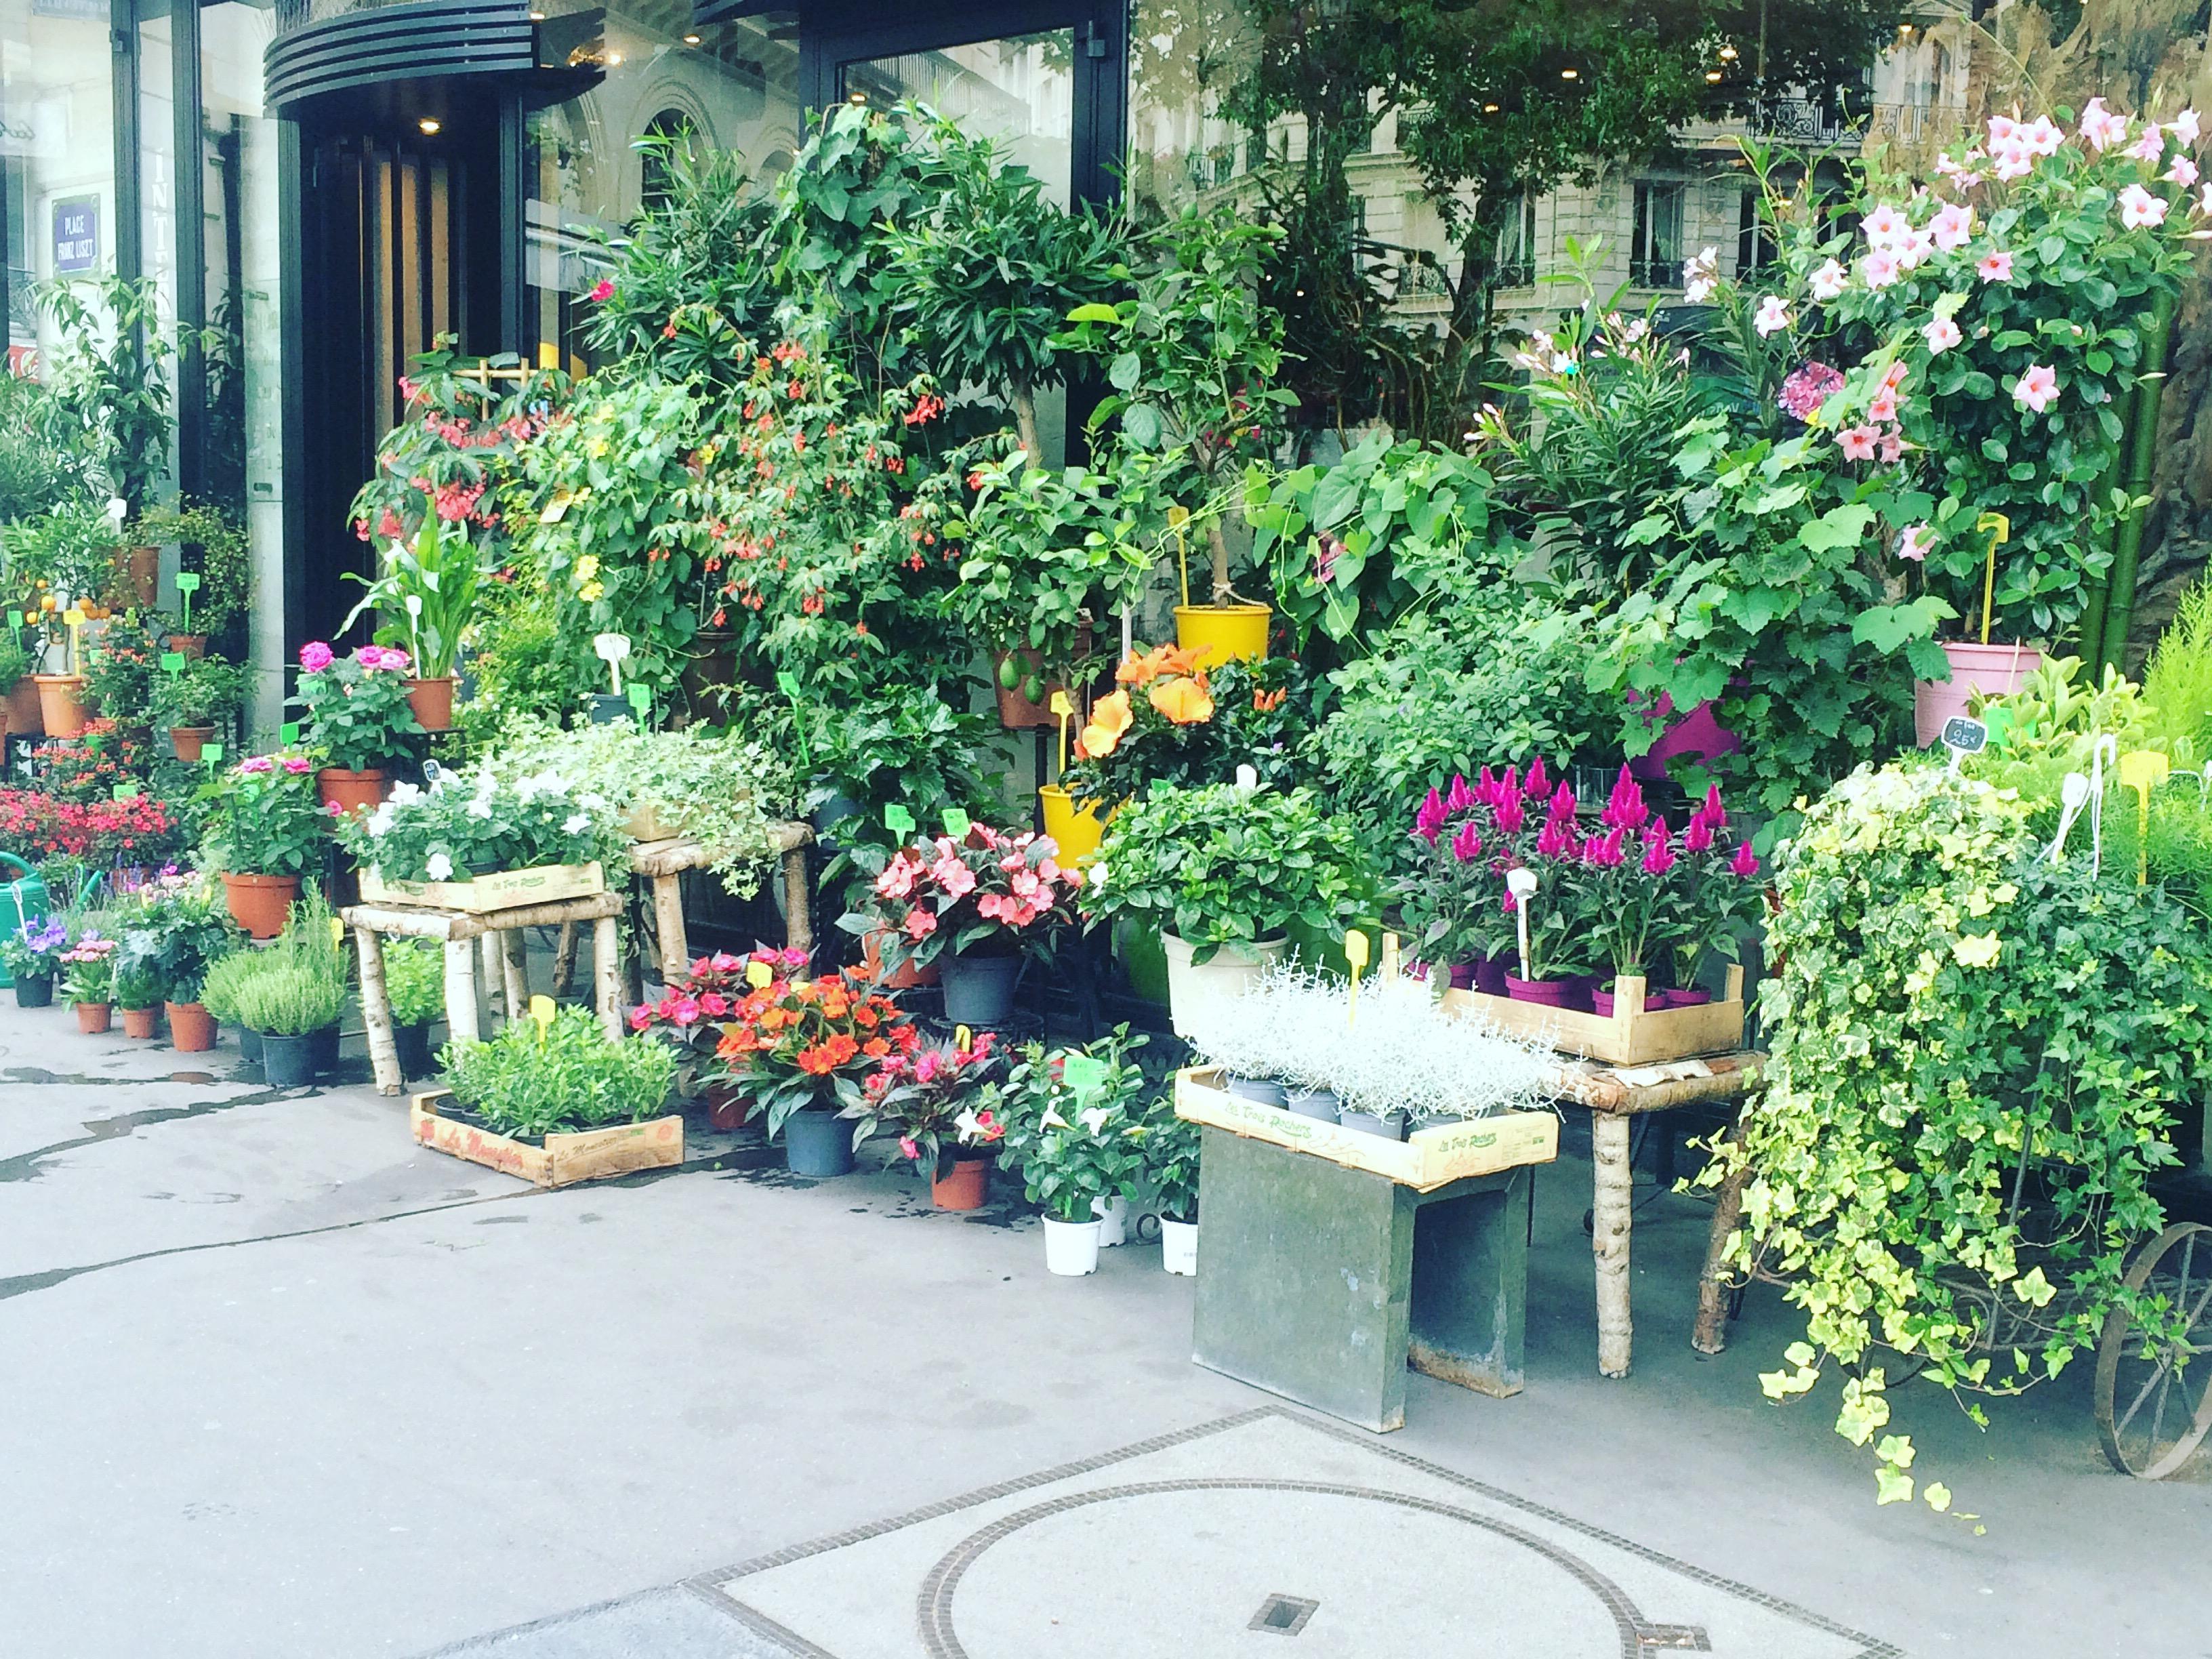 10 places for a fabulous Paris getaway - Summer Edition